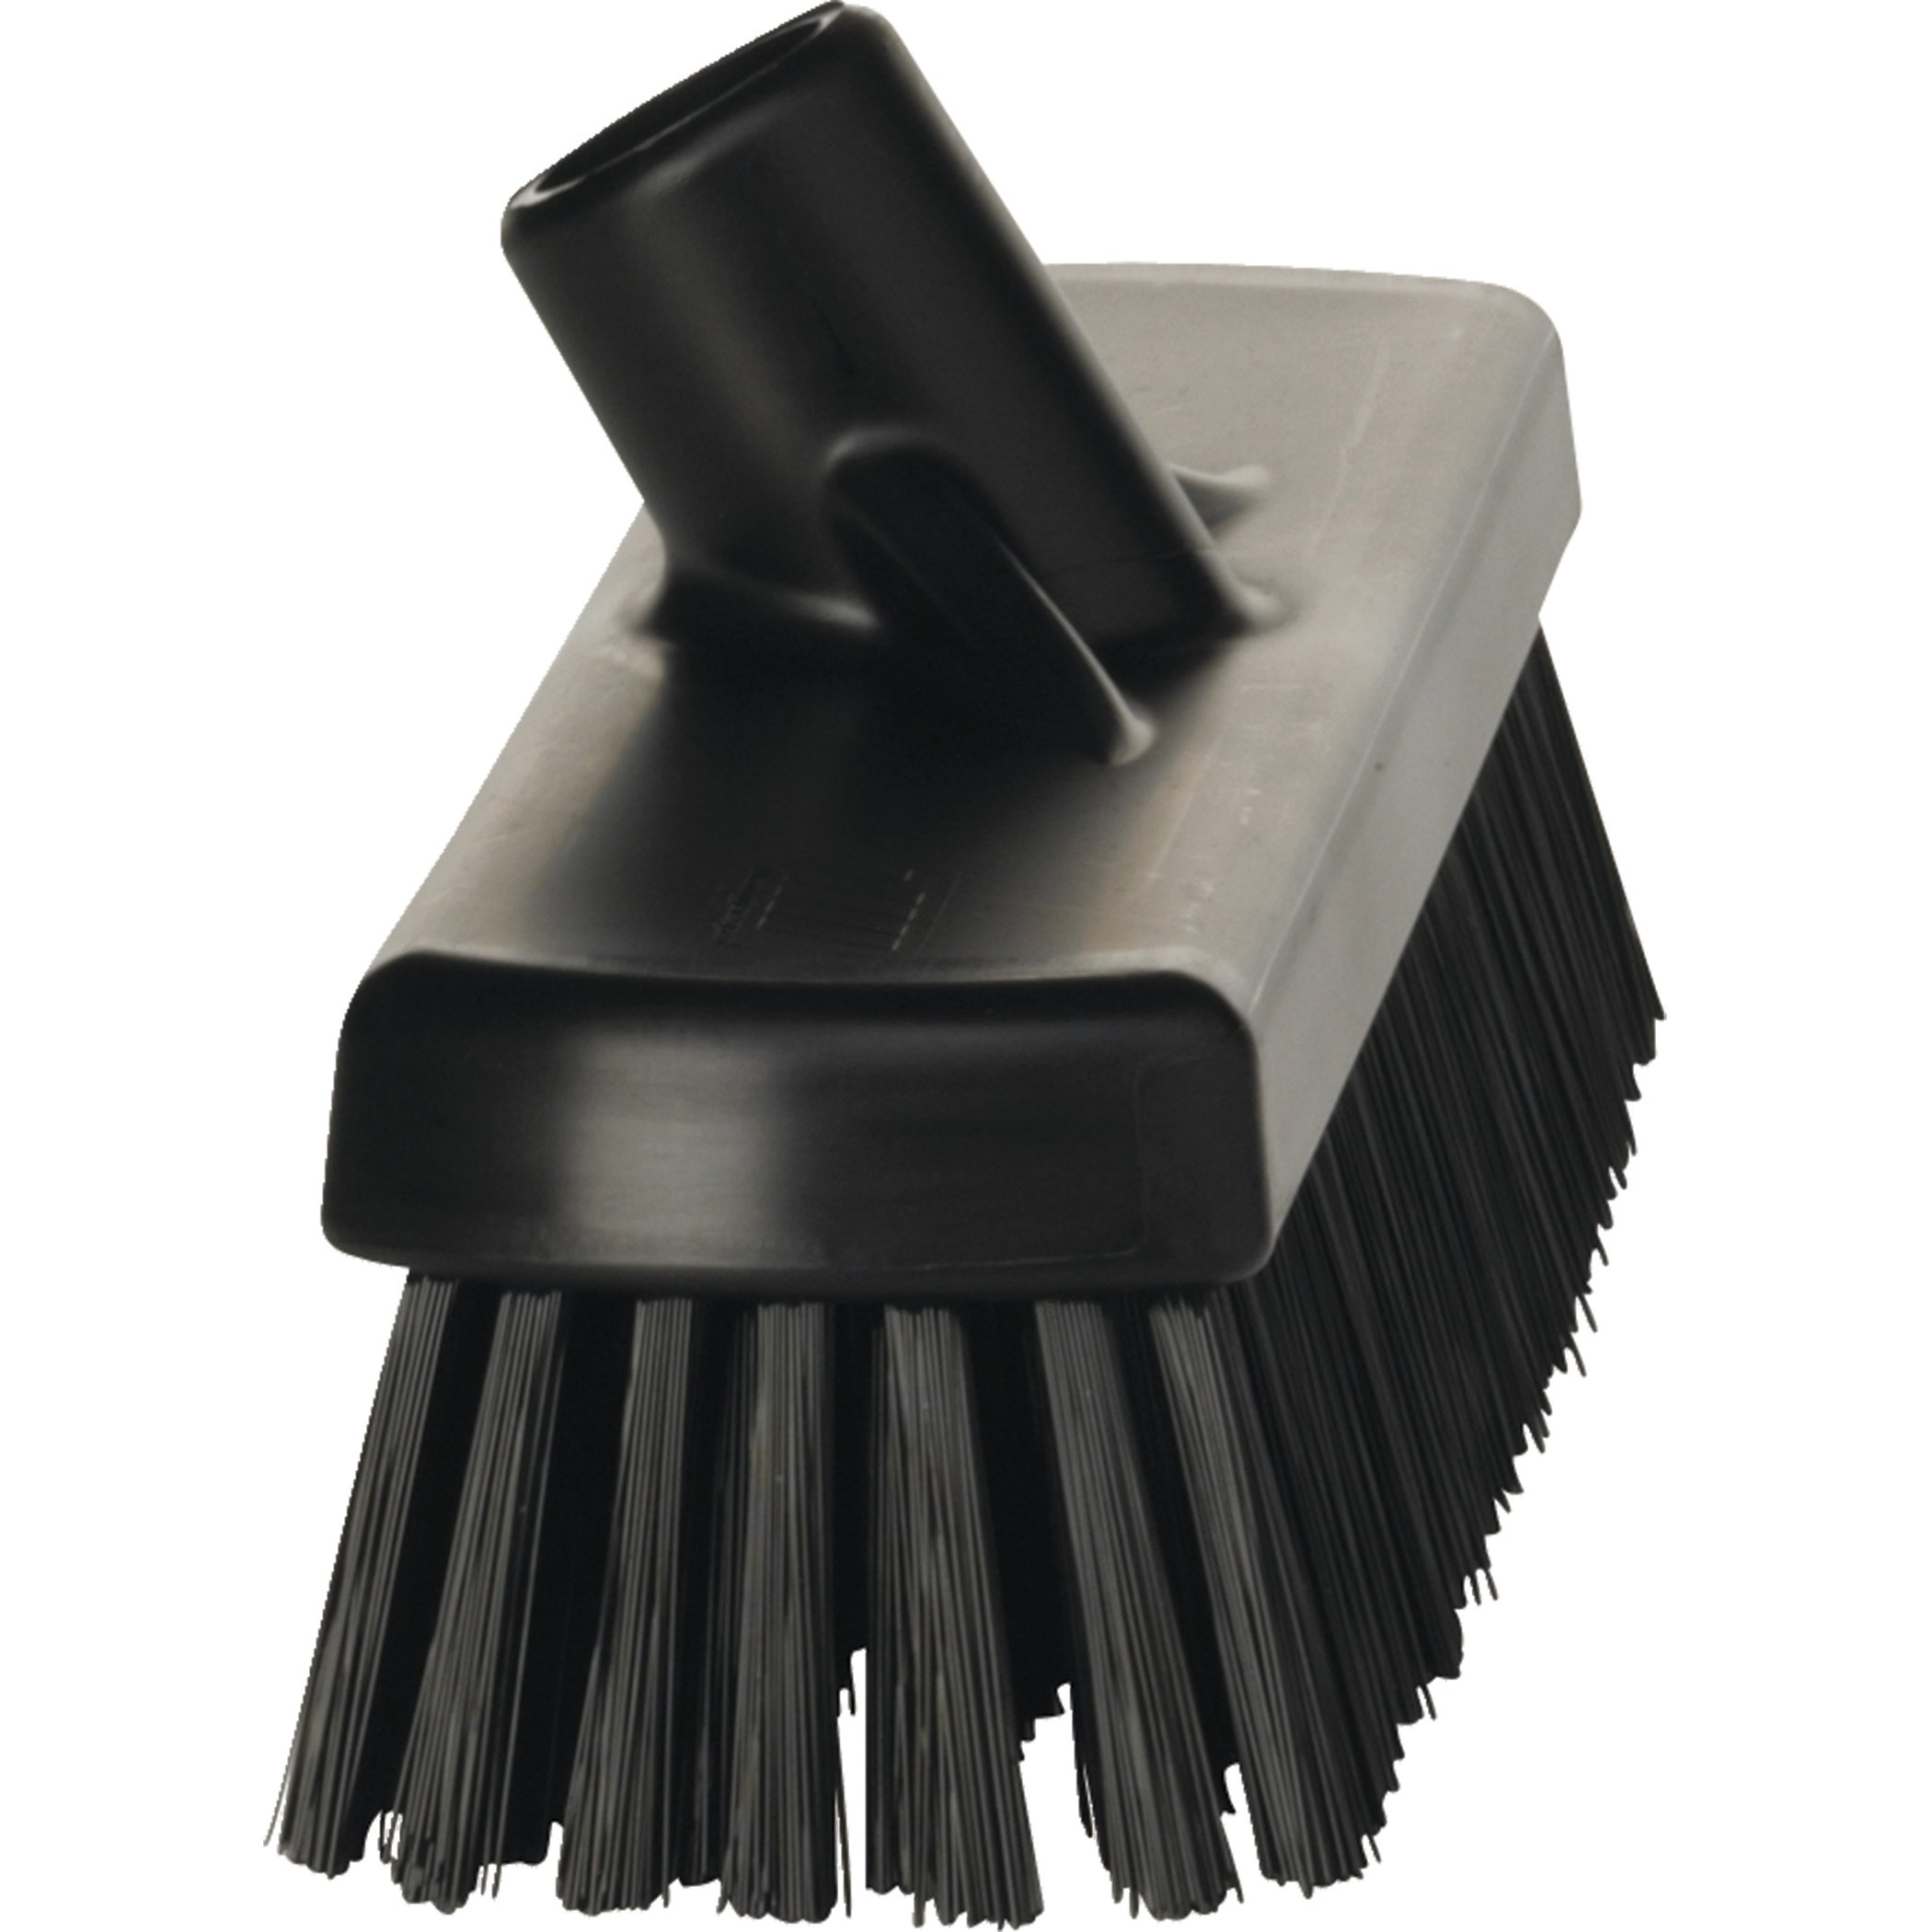 Vikan 70609 Deck Scrub, 11-3/4'' Polyester Bristle, Black